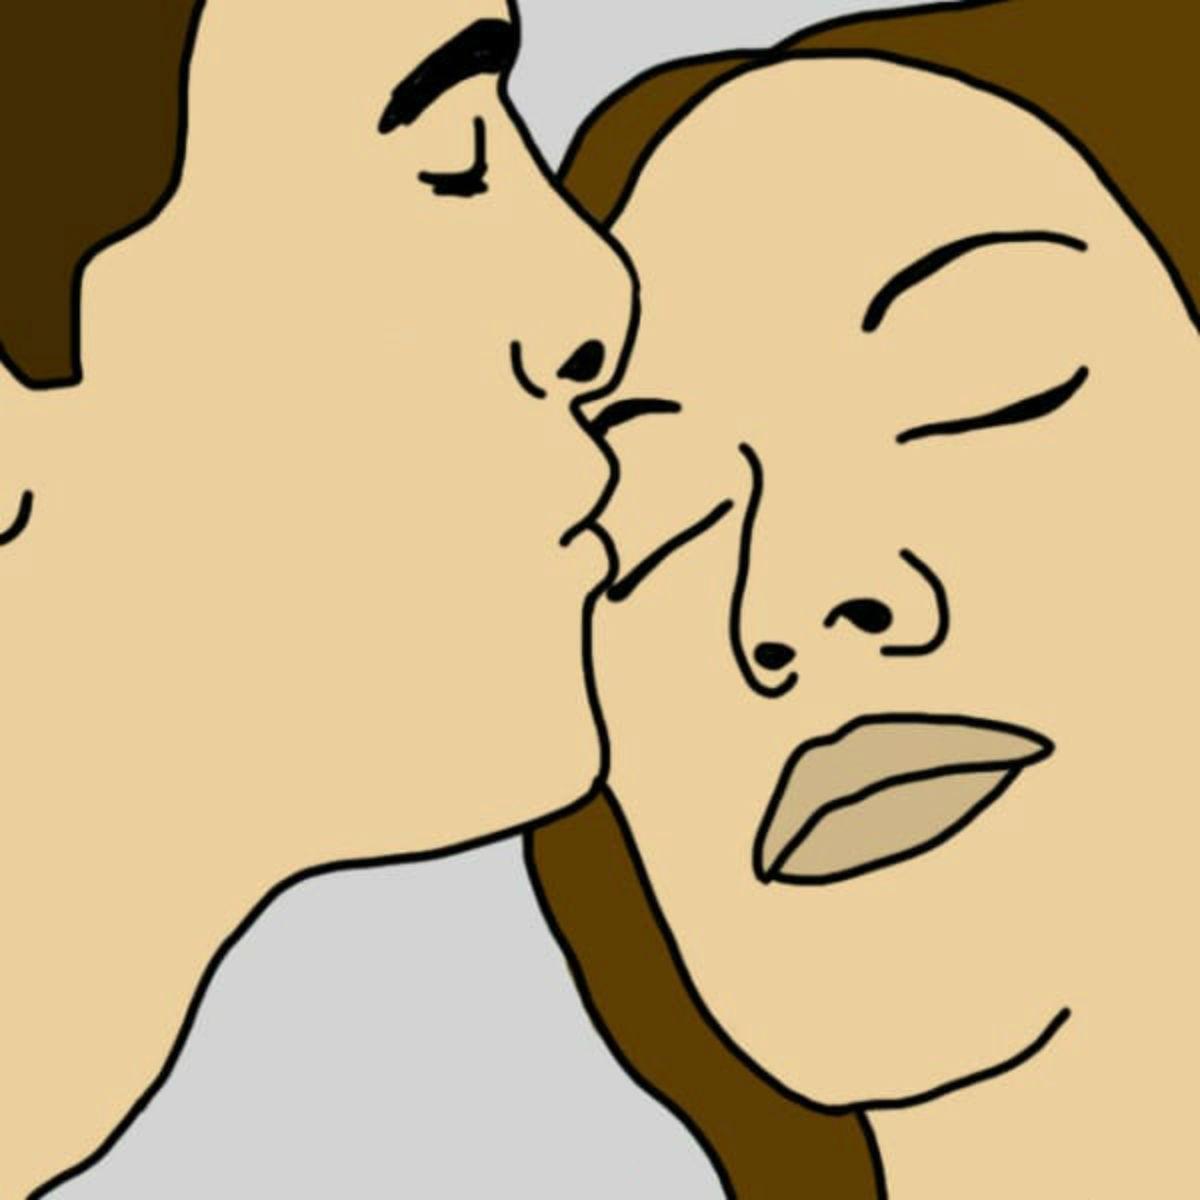 11 Типов поцелуев и о чем они говорят